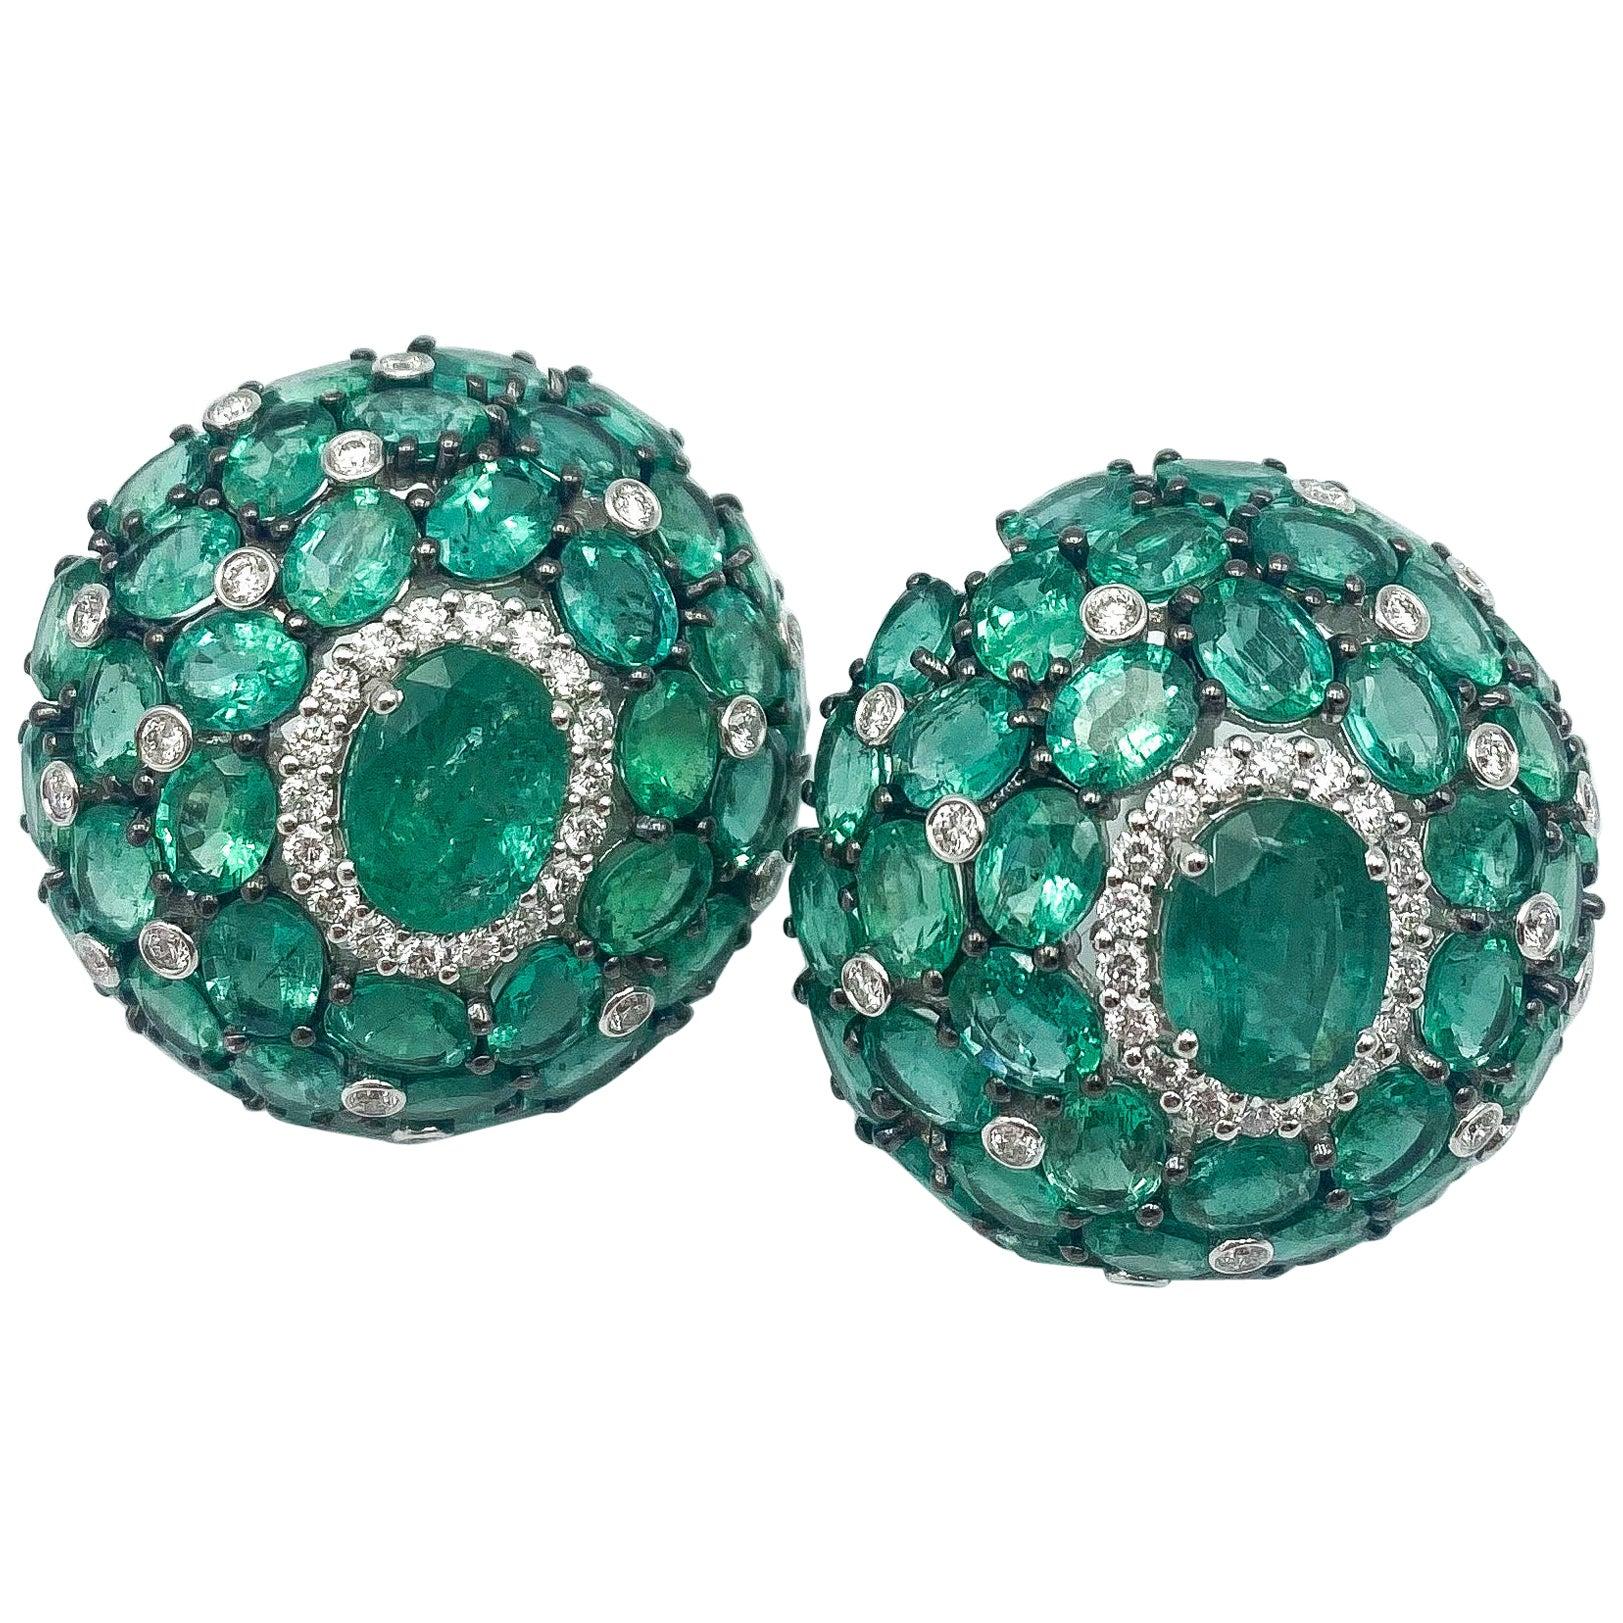 Emerald Earrings 27.64 Carat with Diamonds 1.20 Carat F/VS 18 Karat Gold